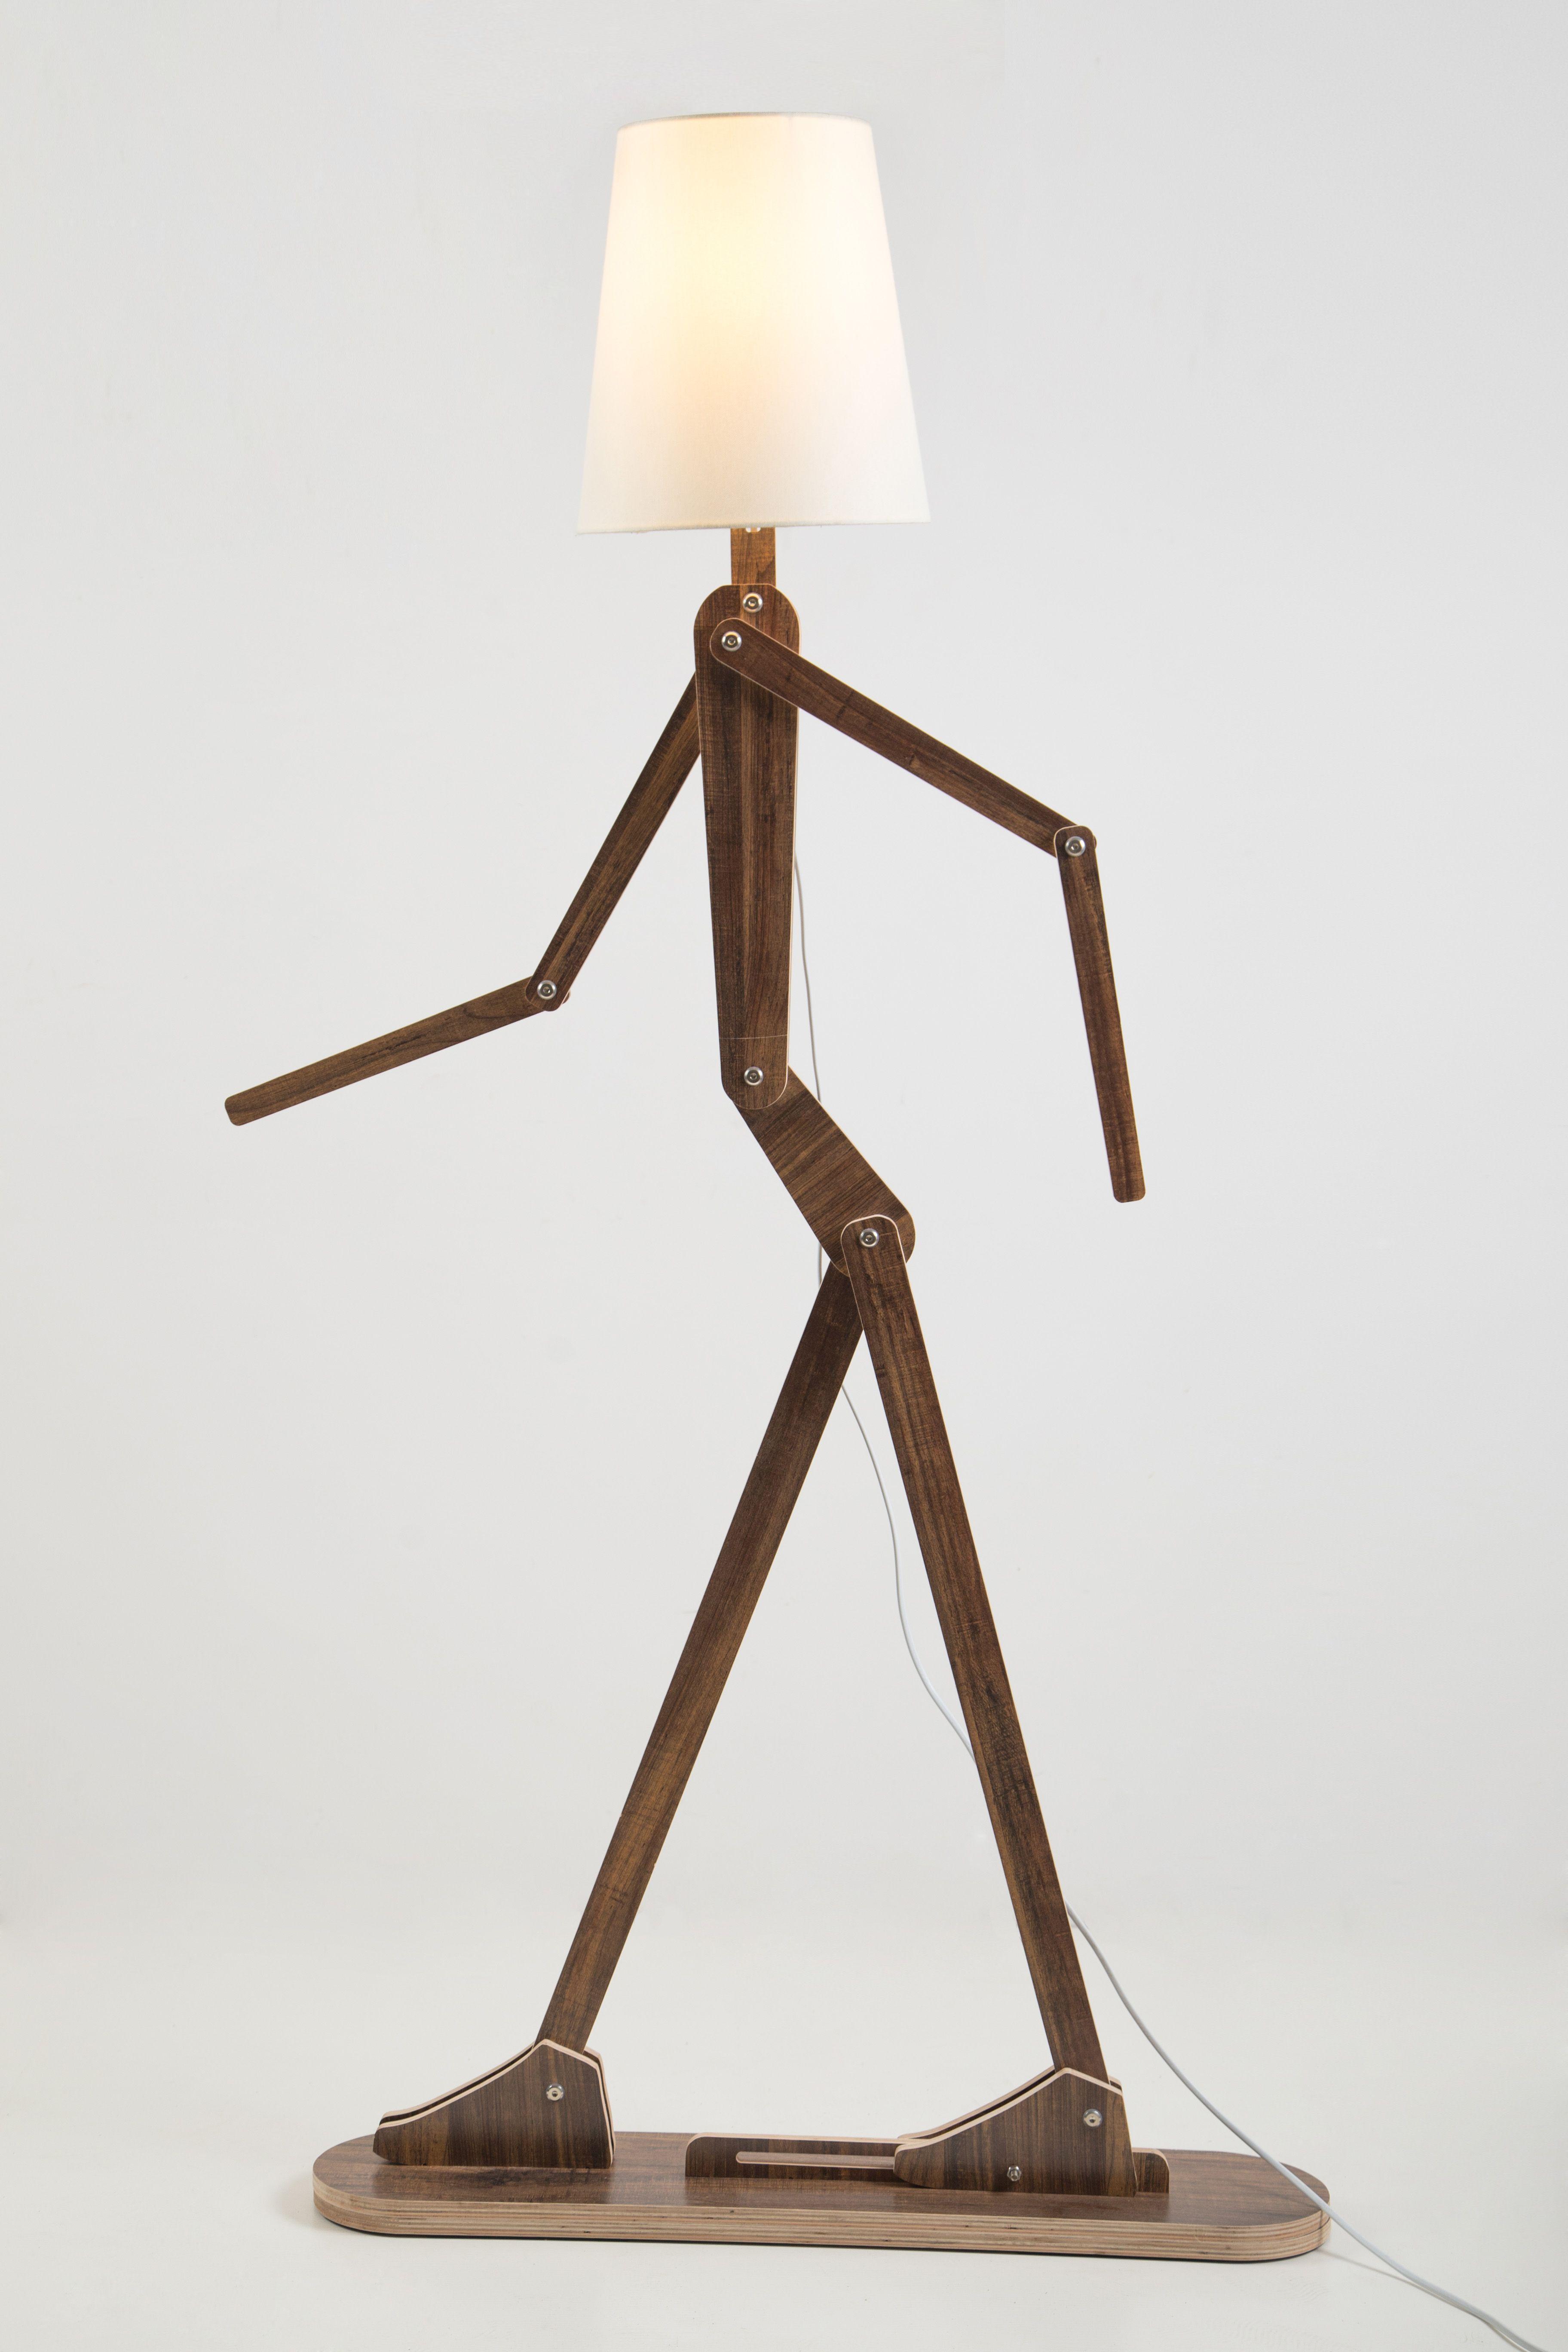 Diy Wood Floor Lamp Diy Fancy Human Shape Standard Lamp With Flexible Arm Rustic